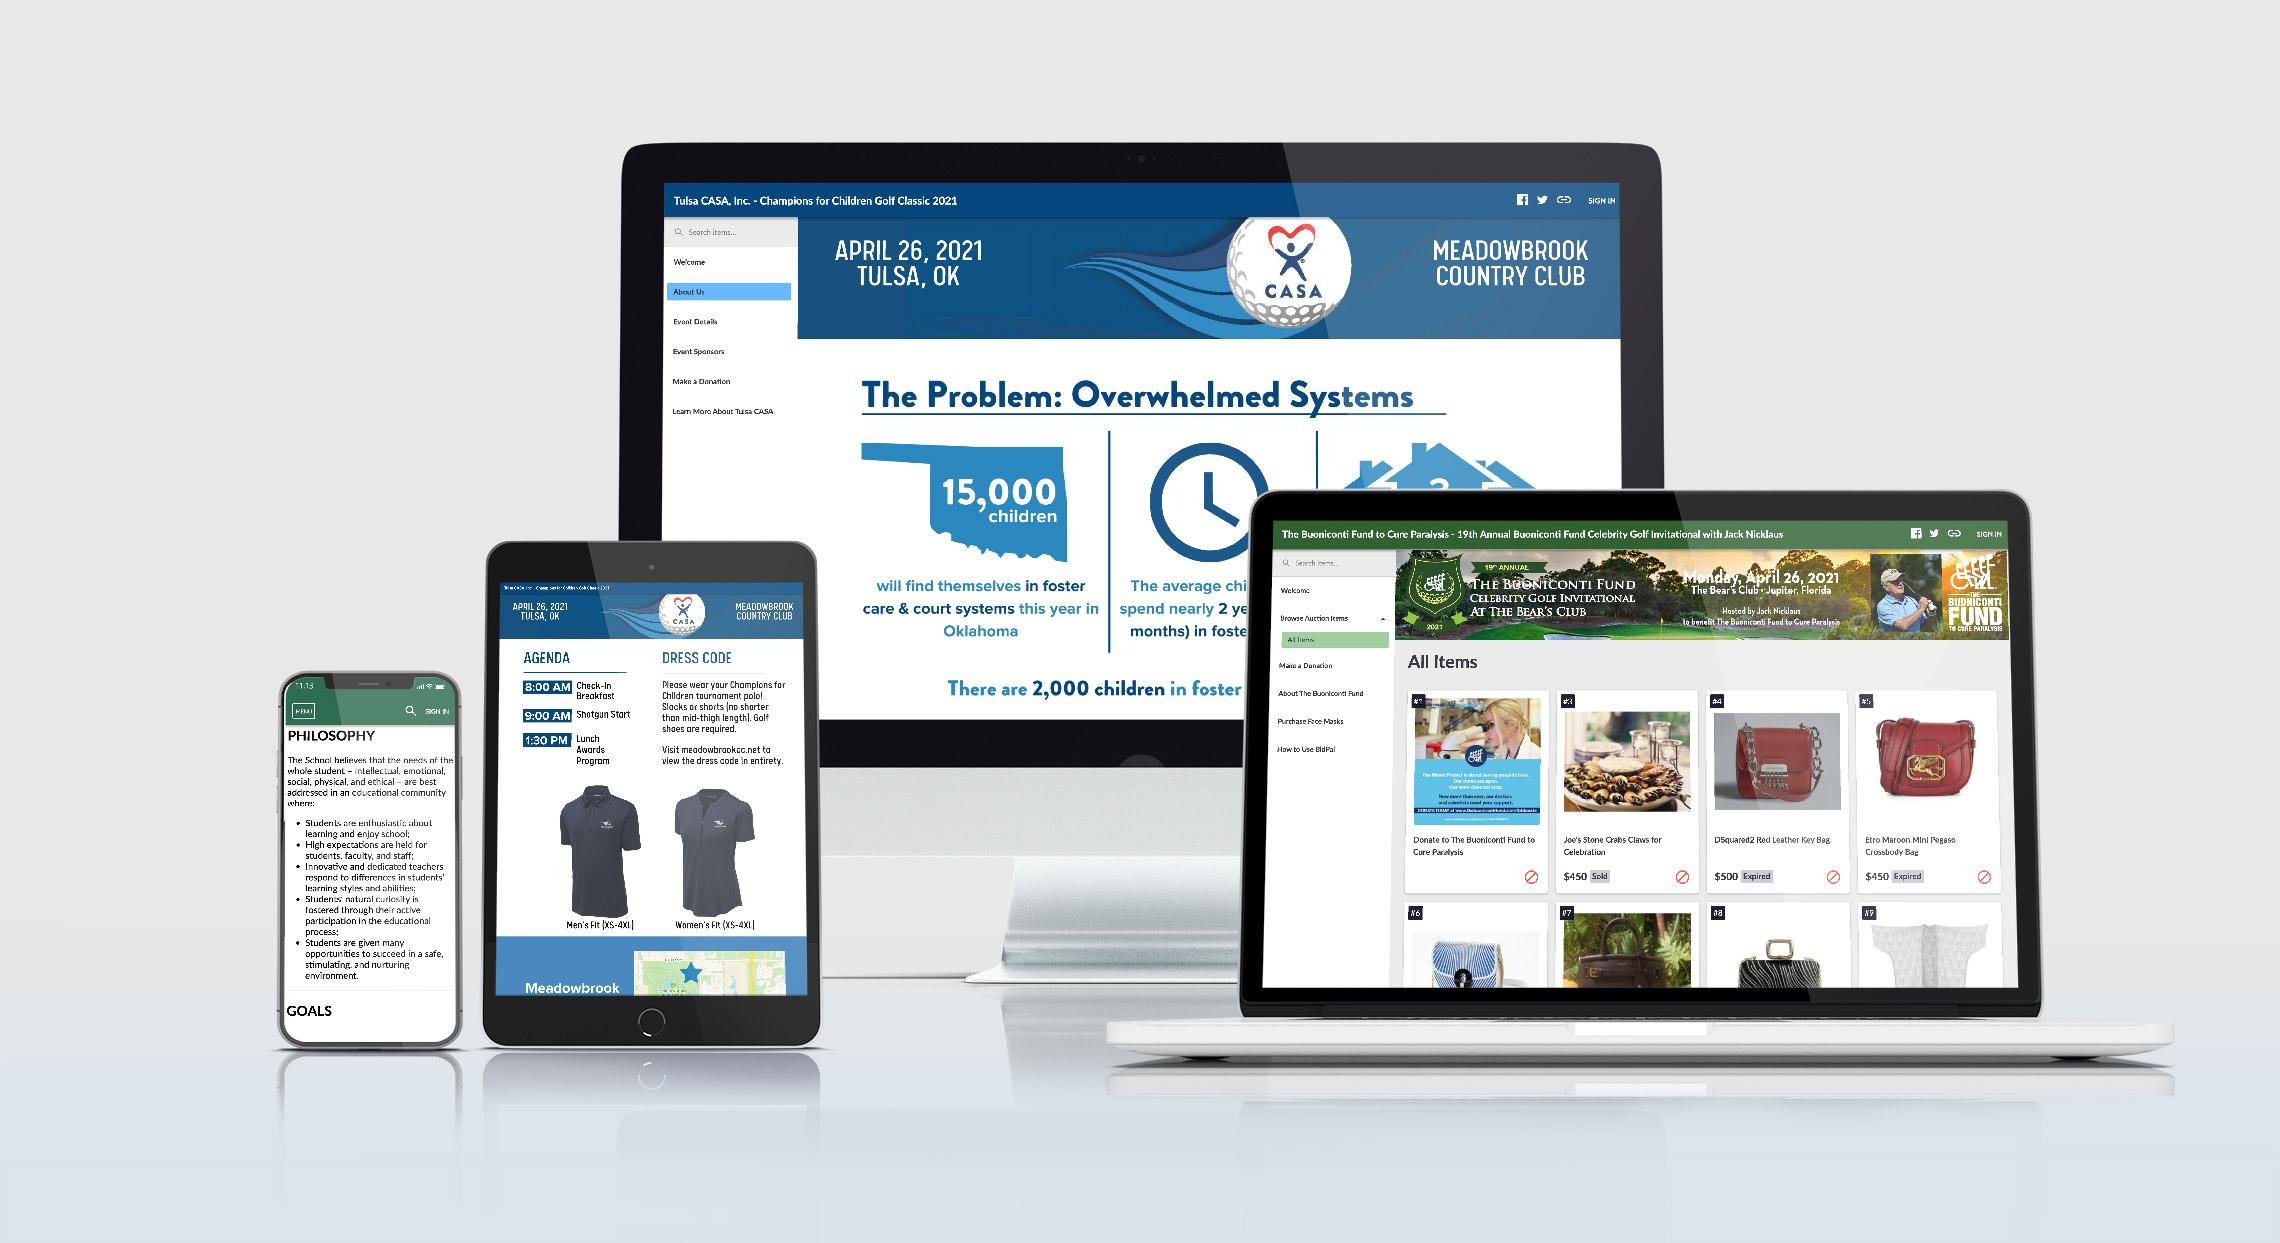 OneCause Virtual Fundraising Tools